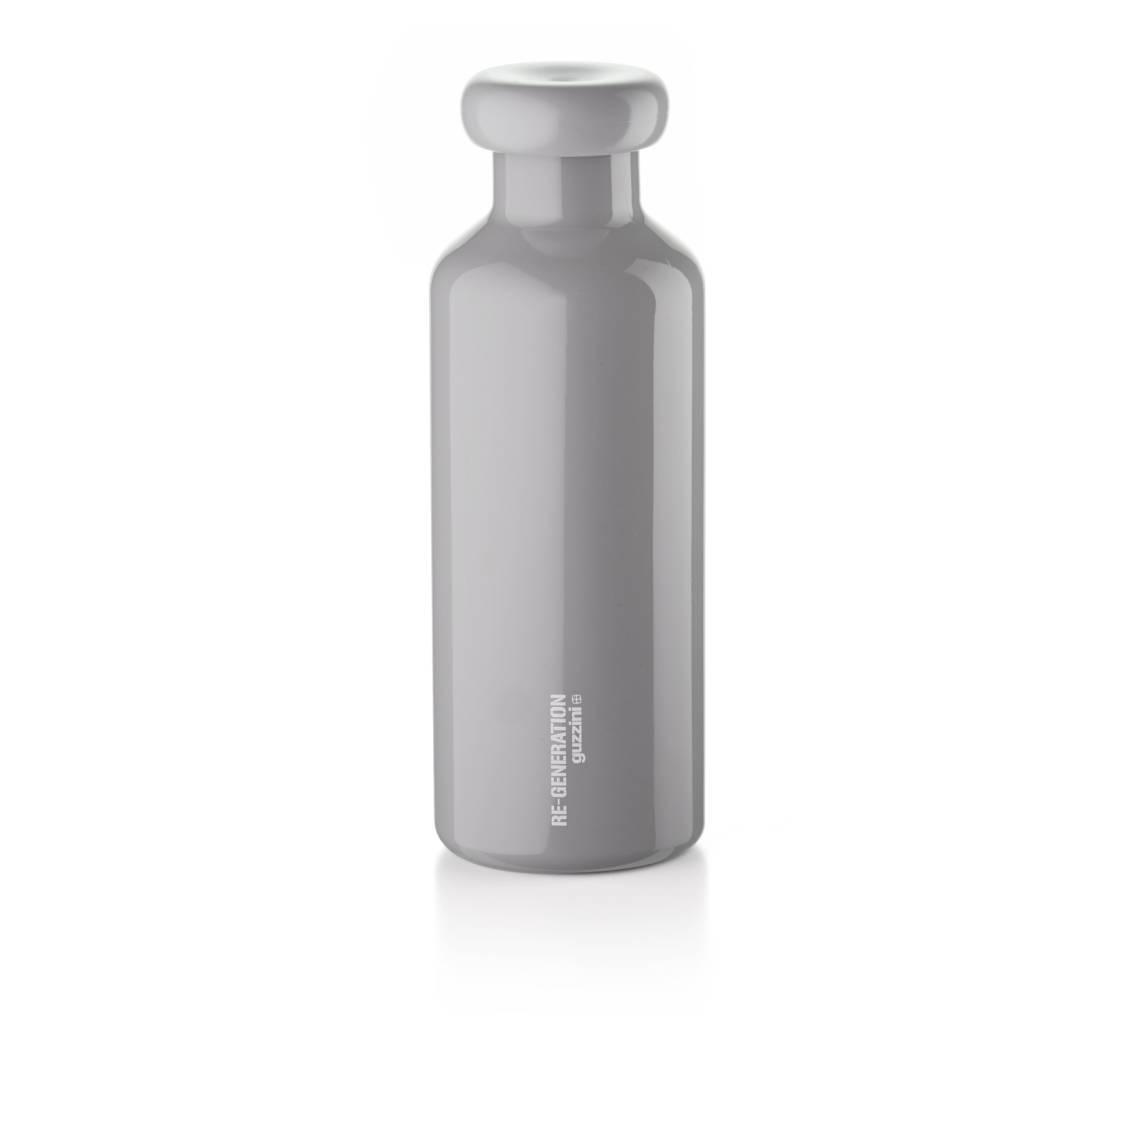 Guzzini Re-Generation Trinkflasche 05330033